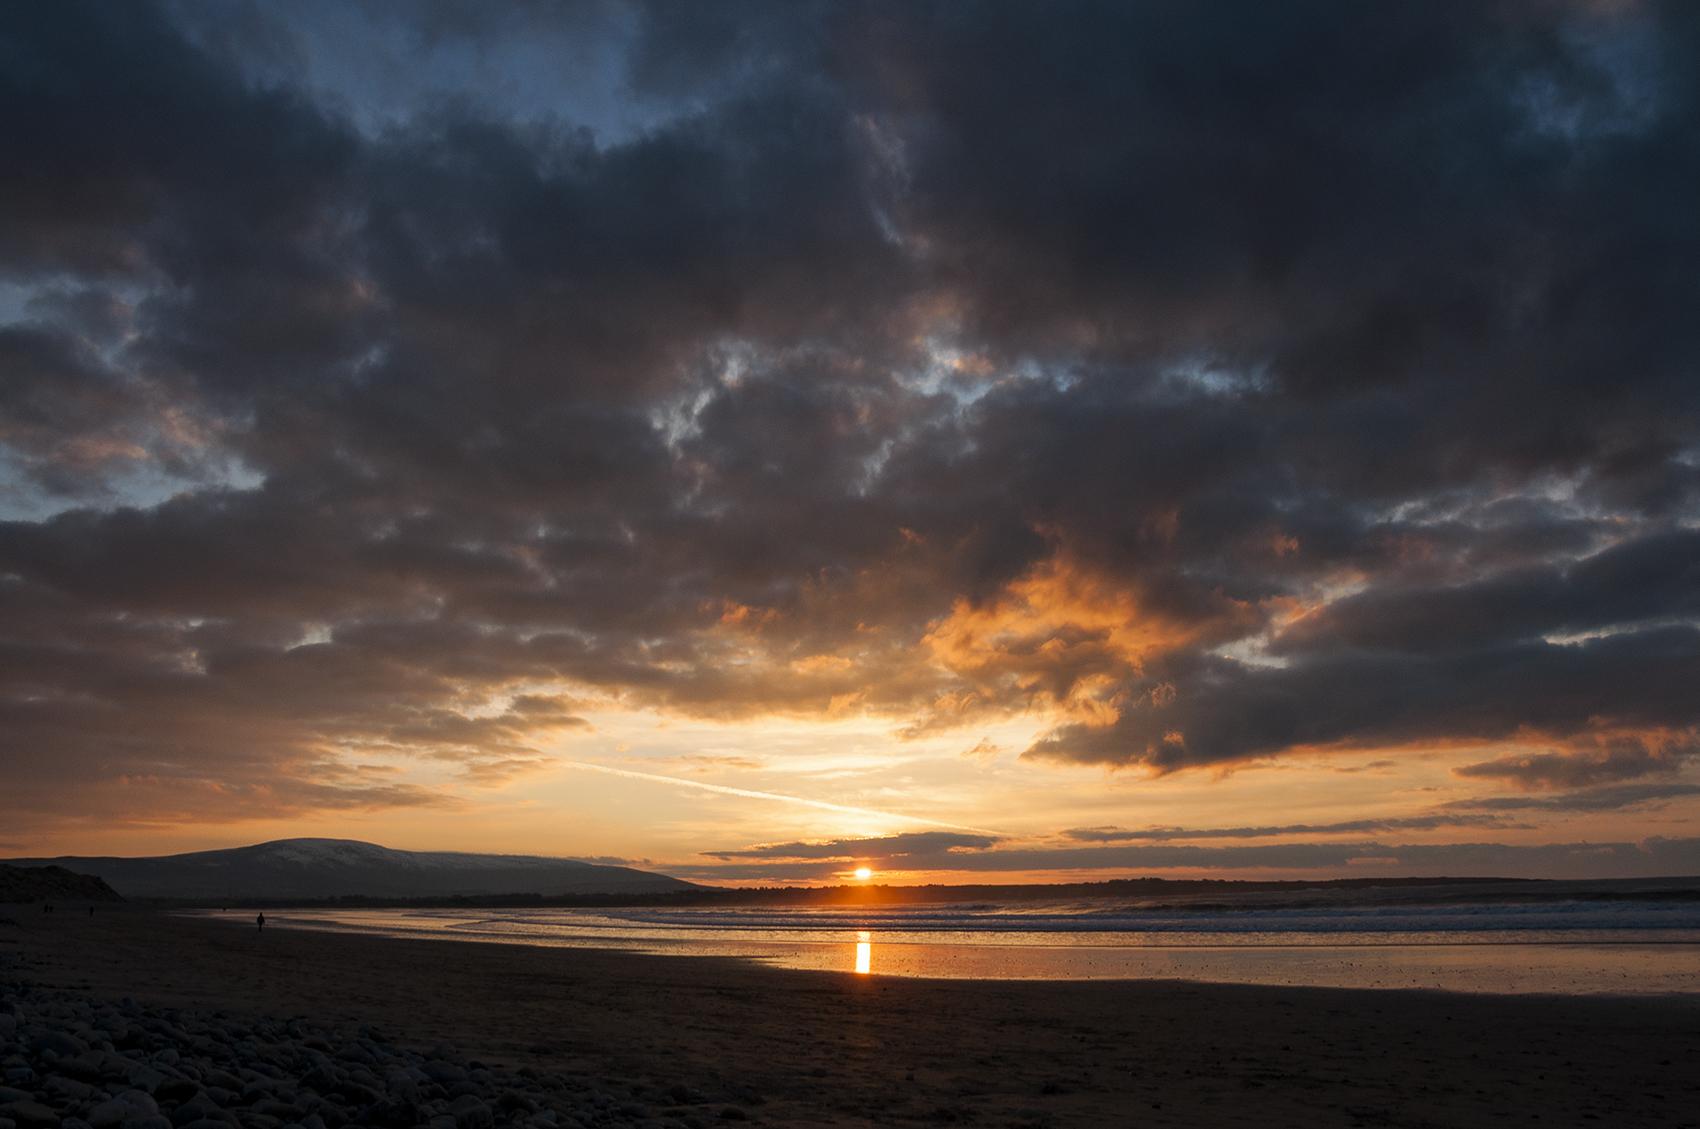 Sunset at Strandhill Beach, Sligo